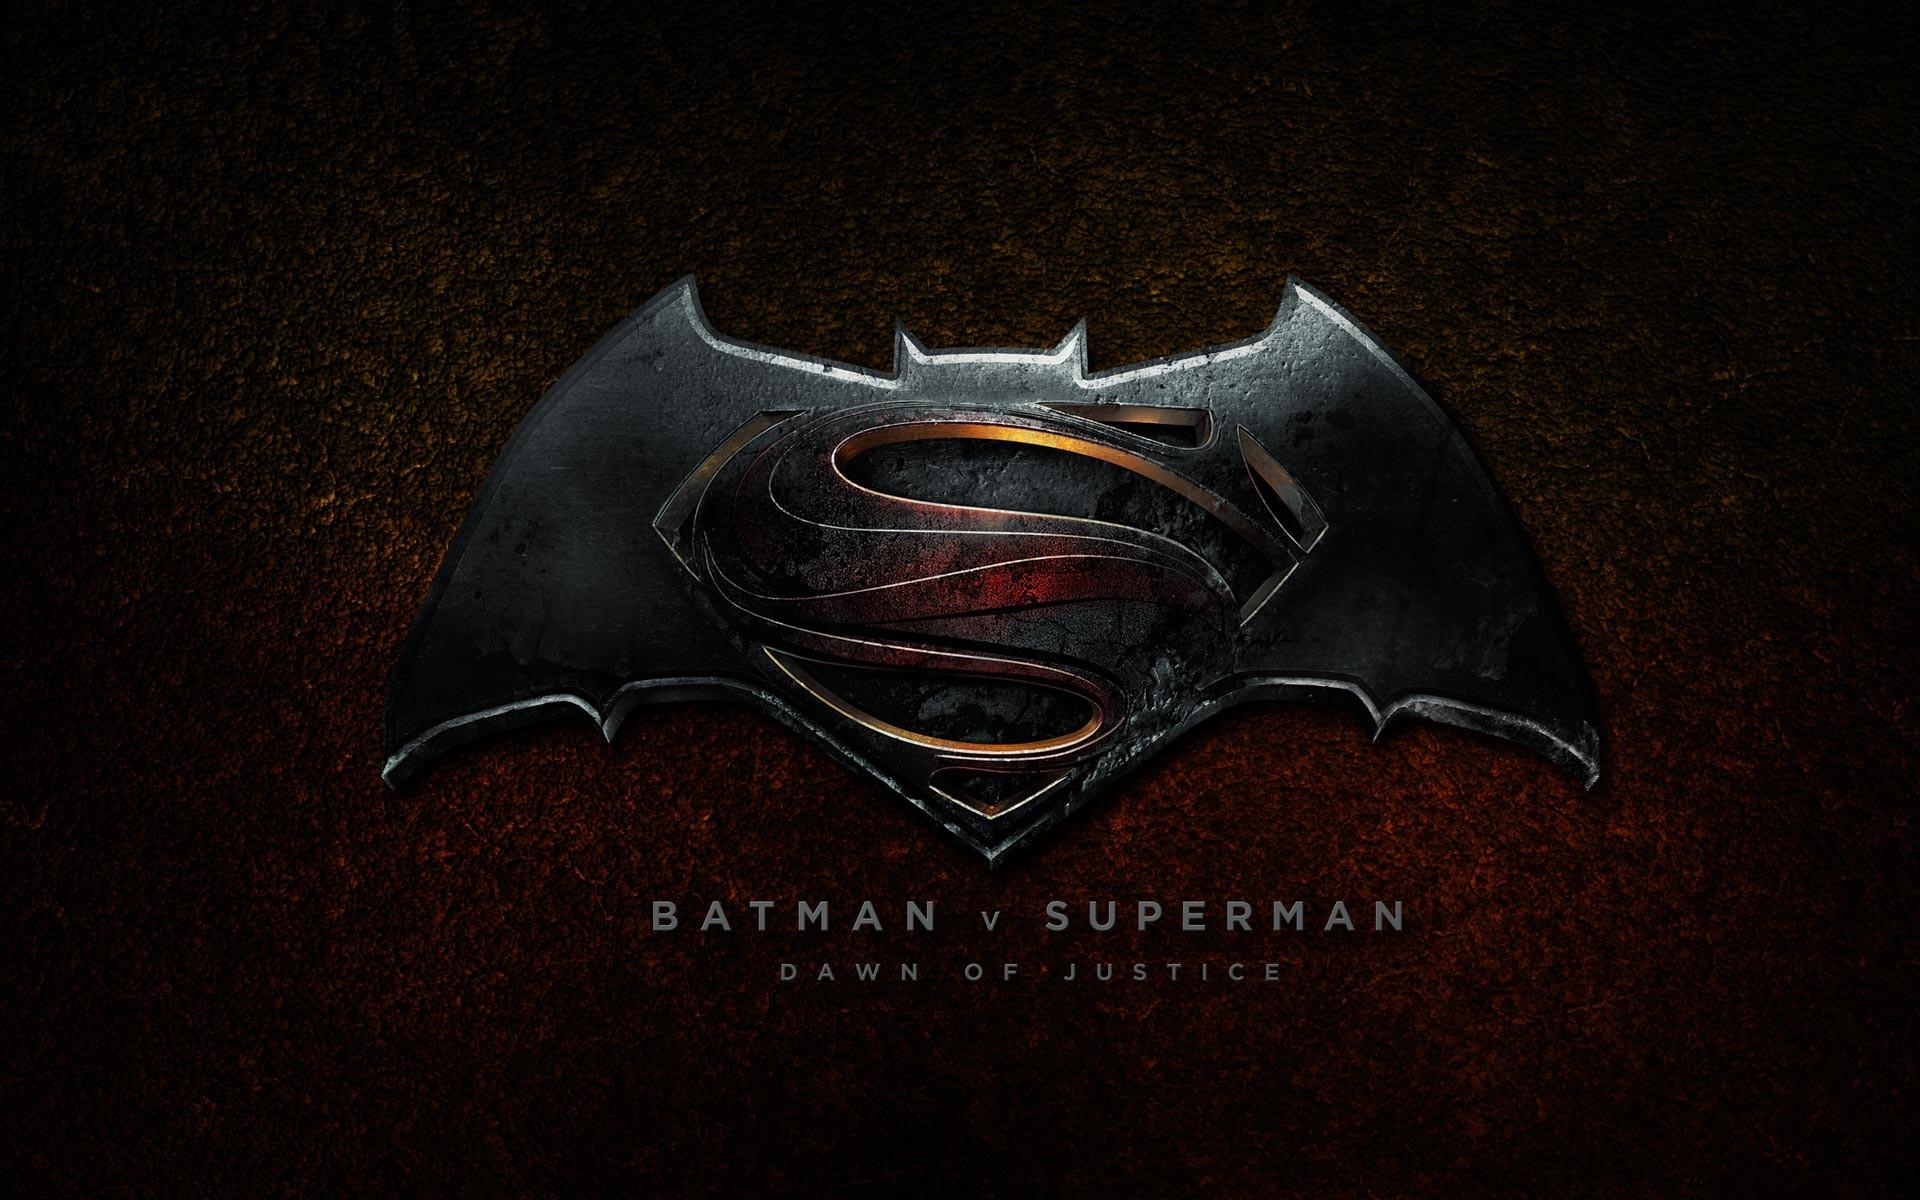 Batman Vs. Superman Vs. Wonder Woman HD desktop wallpaper .